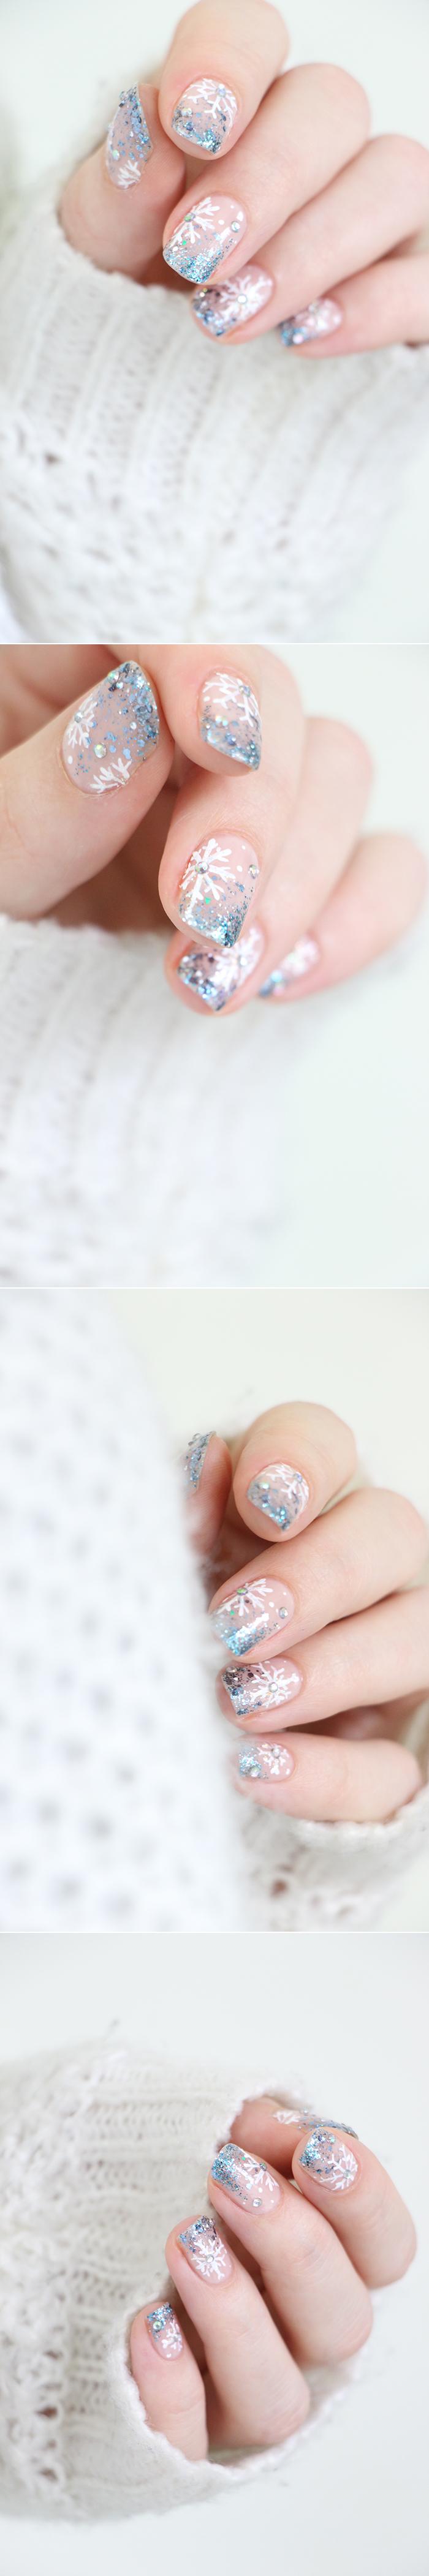 nail-art-flocons-snowflakes-2